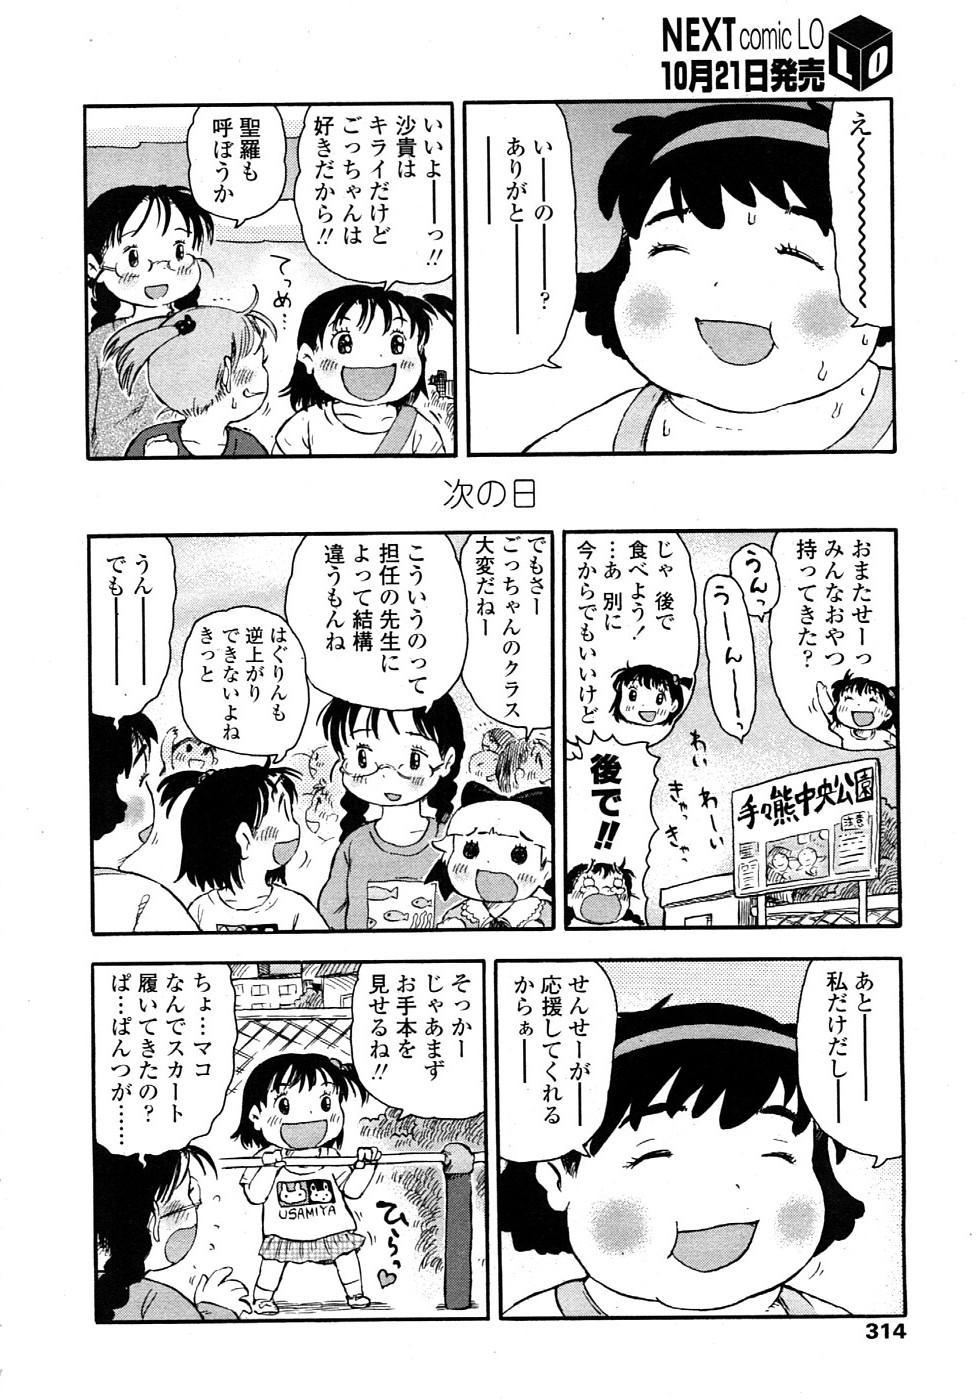 Comic LO 2008-11 Vol. 56 313